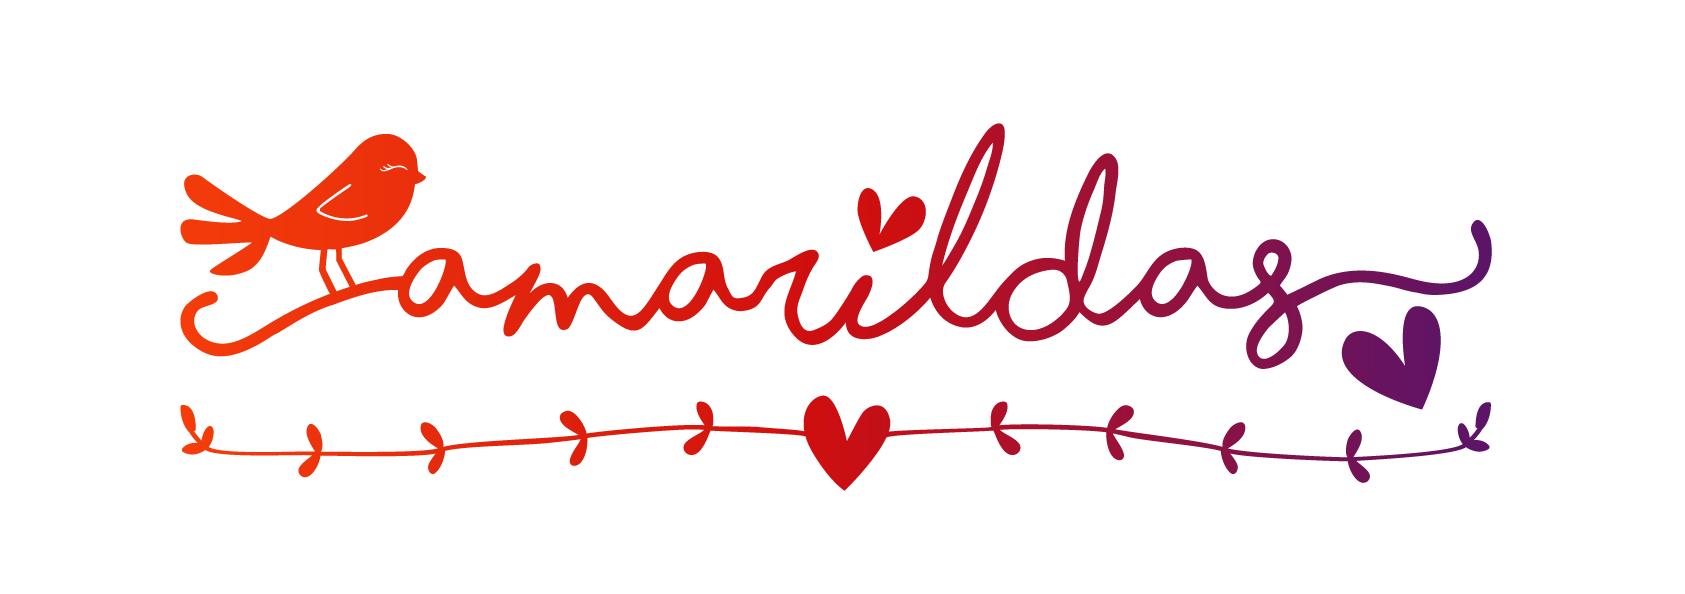 Bergamota-Amarildas_logo-fundo-branco